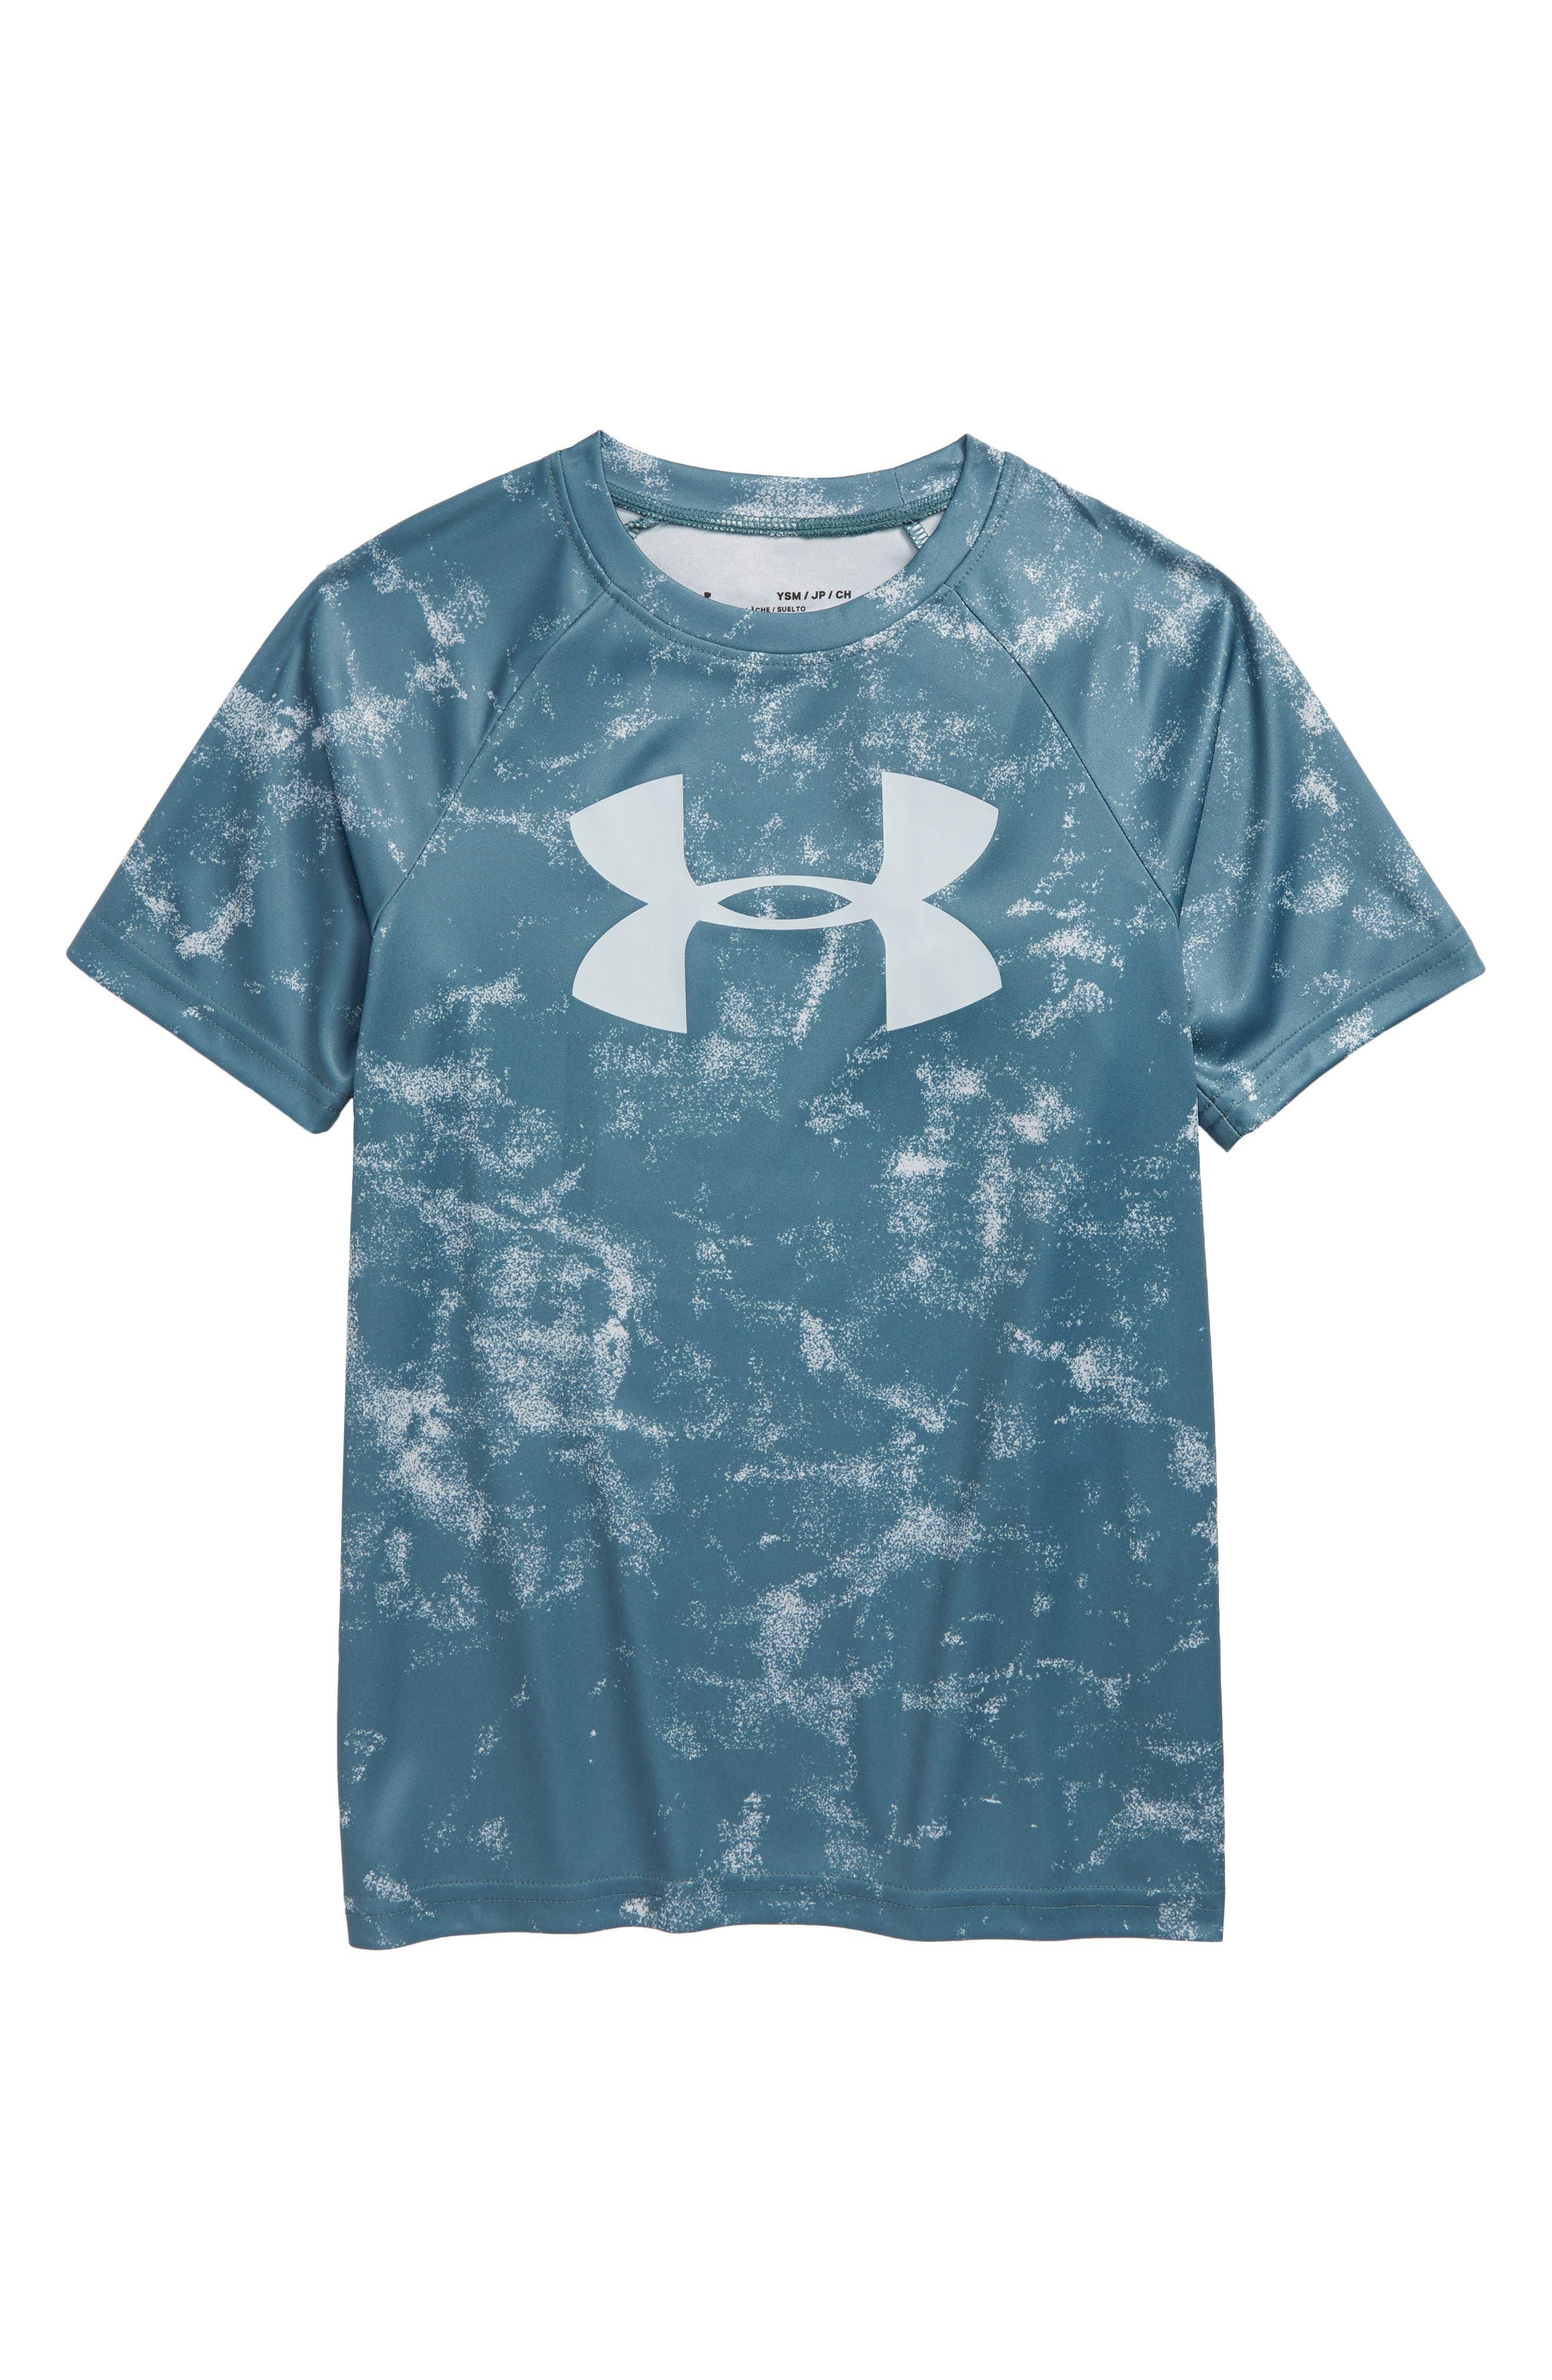 Image of Under Armour Big Logo Printed T-Shirt